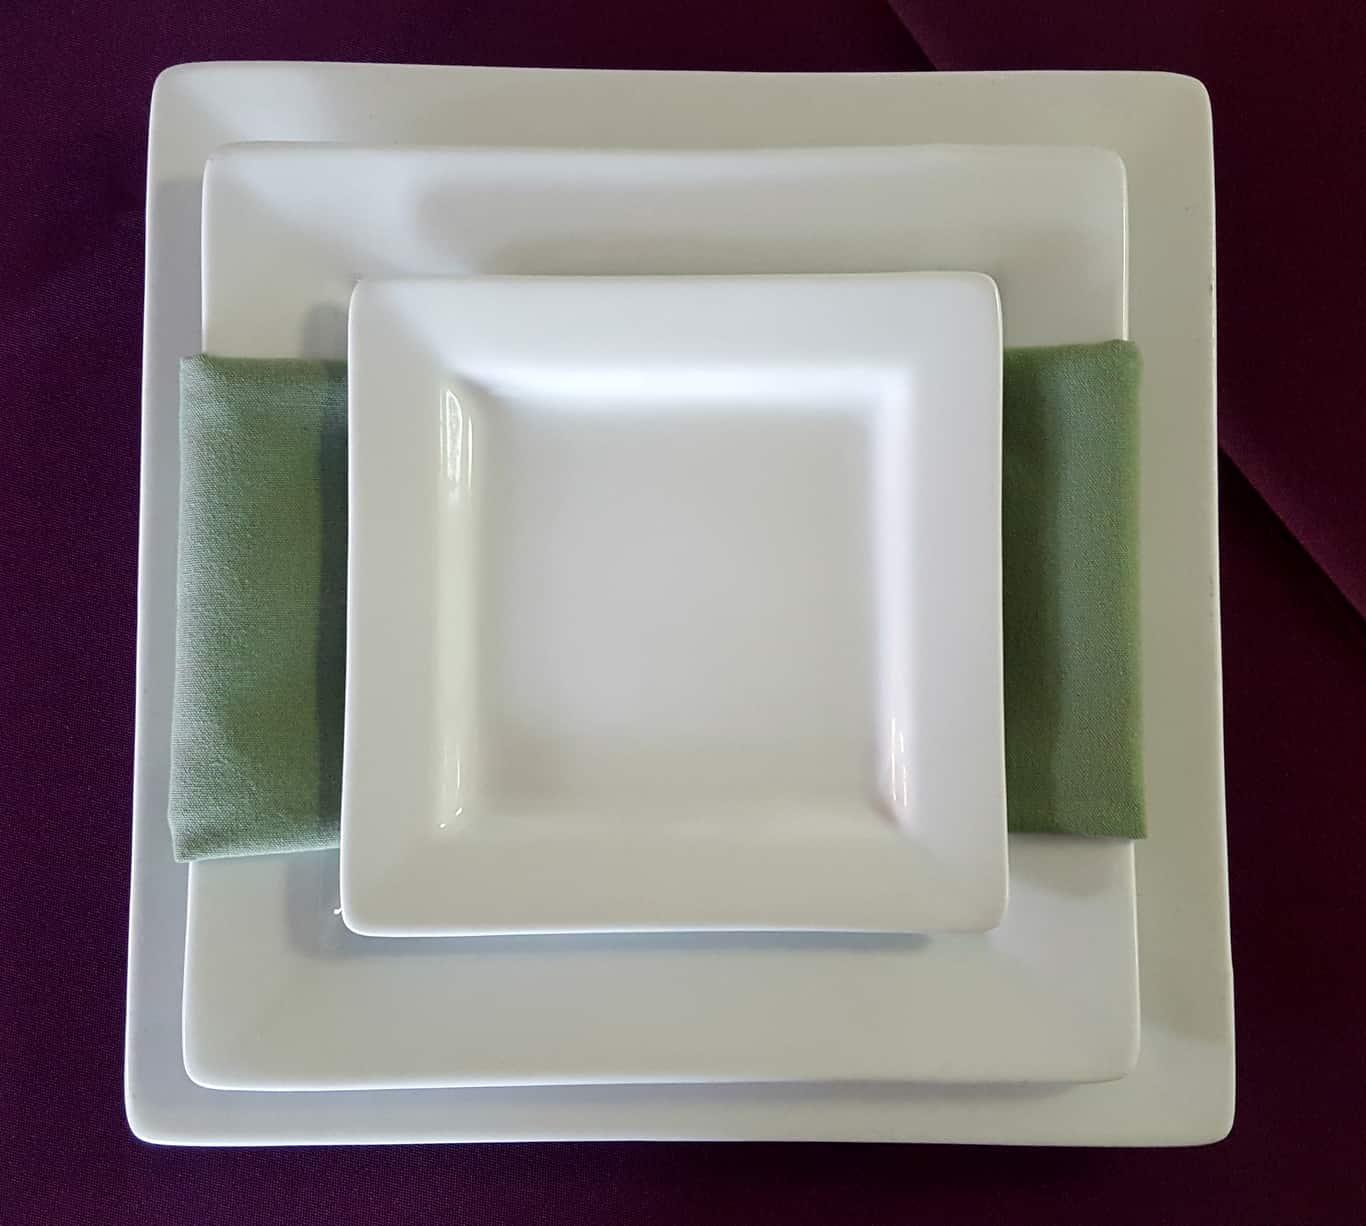 Square White Plates with Napkin